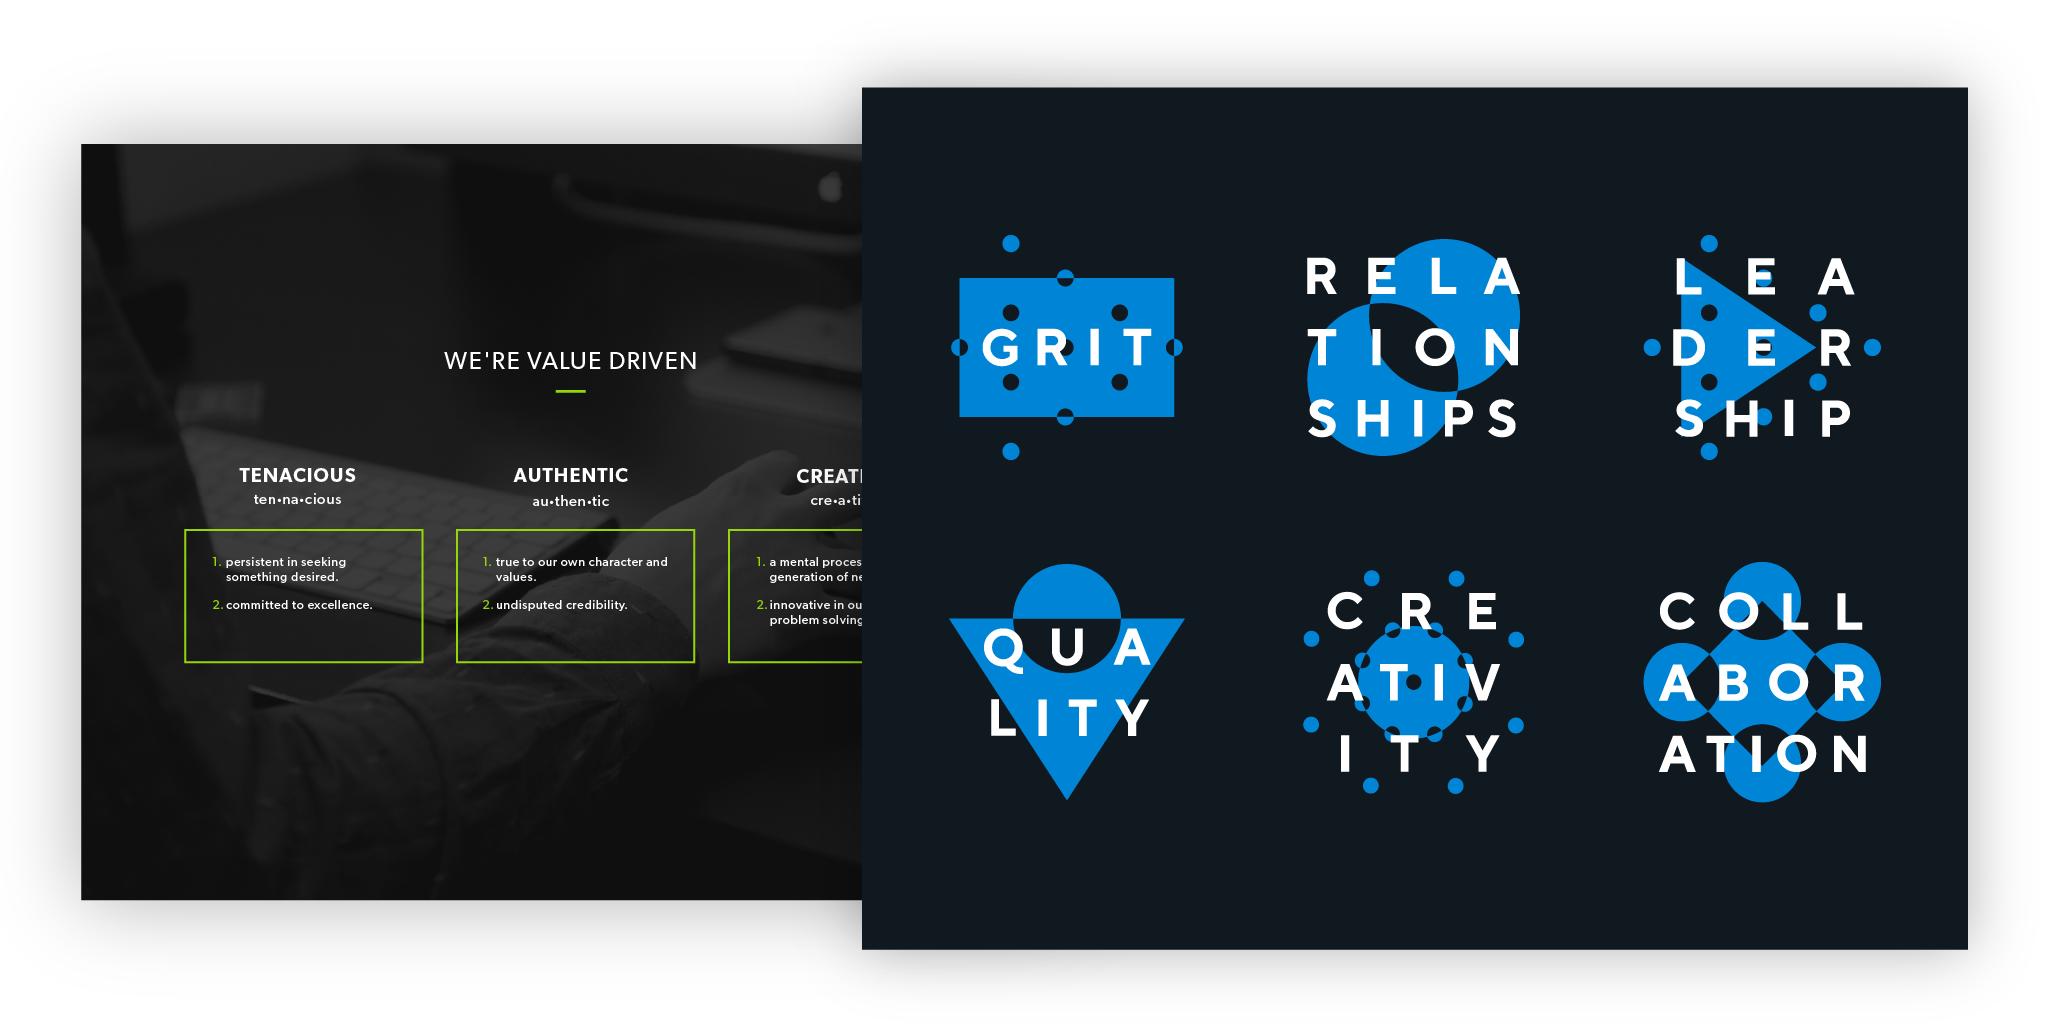 Tiller values before and after rebranding